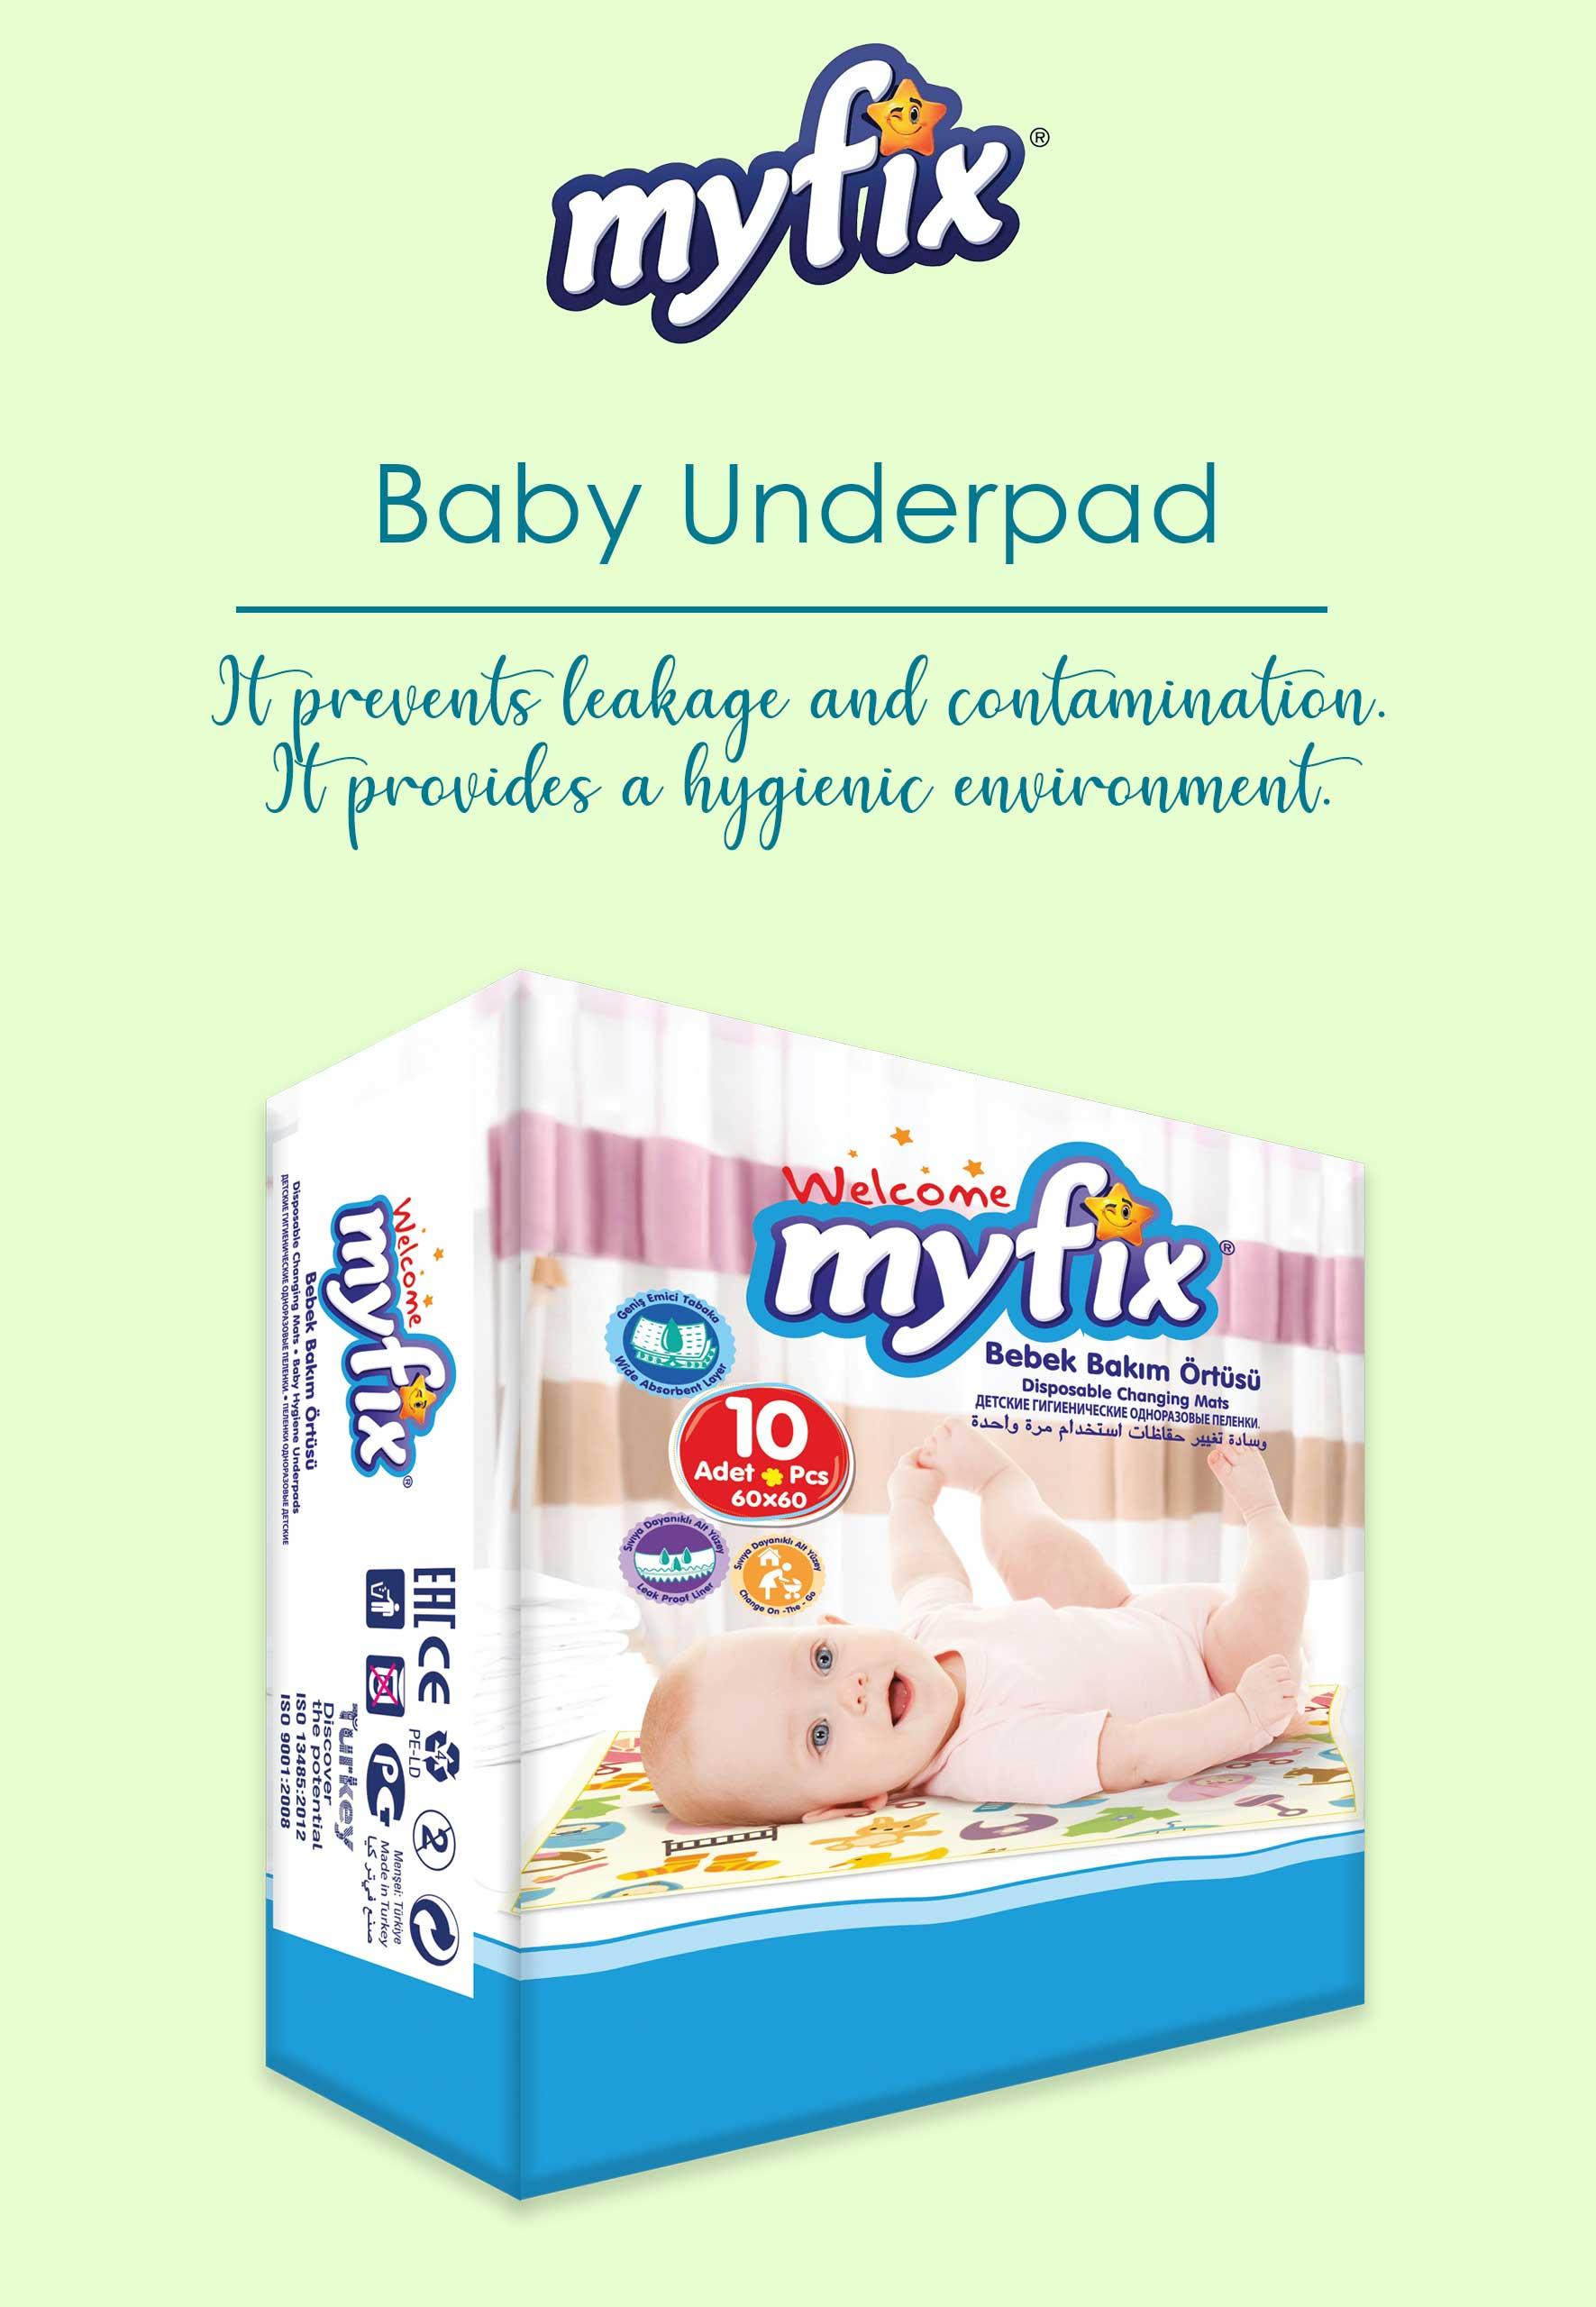 Baby Under pad